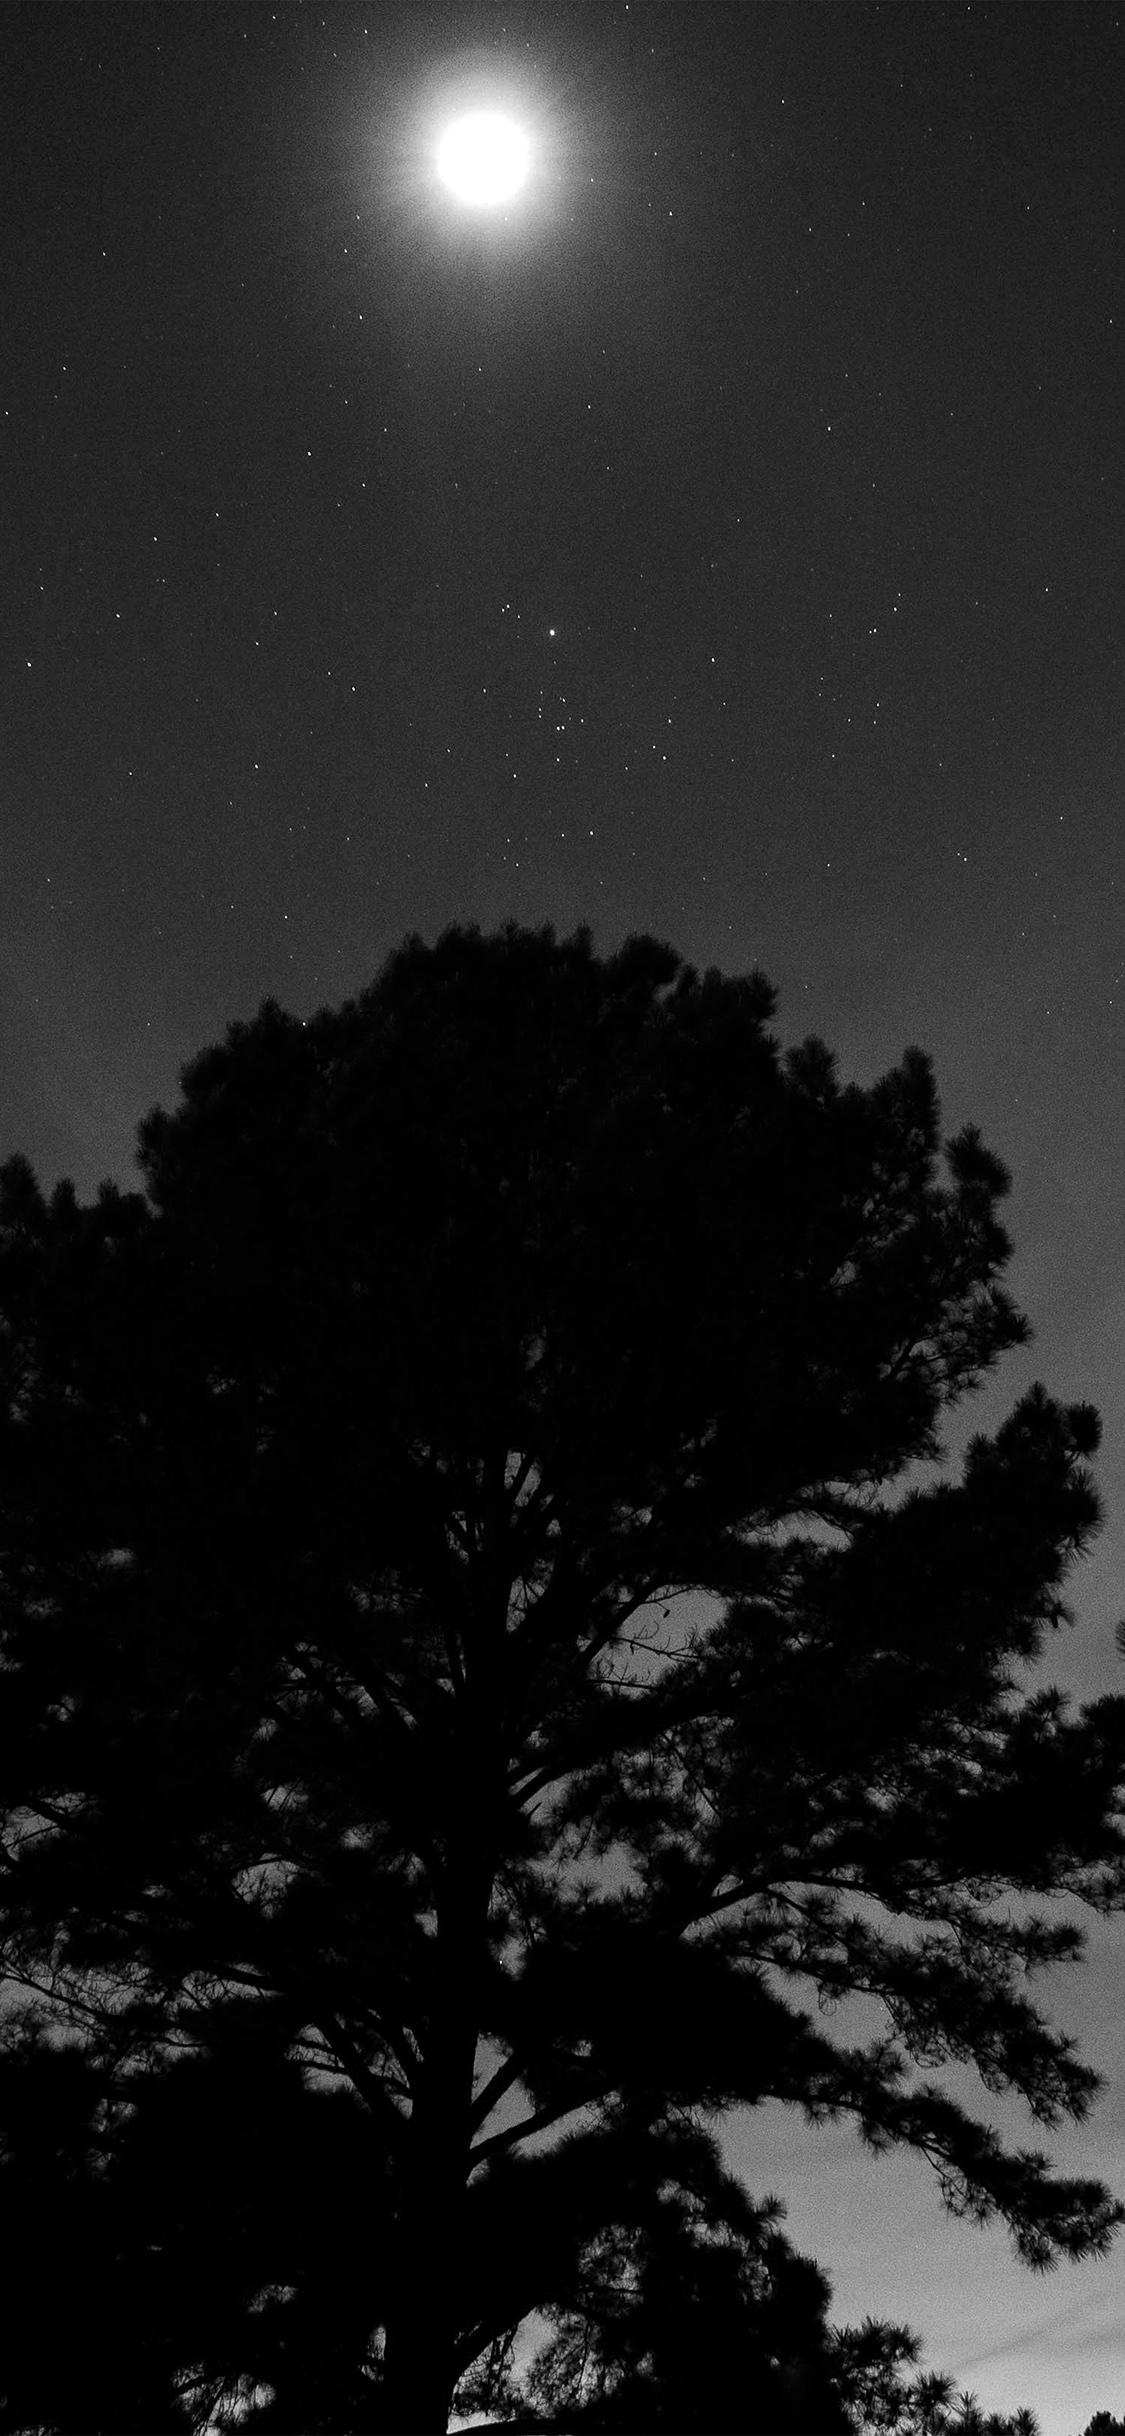 Com Apple Iphone Wallpaper Nj69 One Star Shine Night - Dark Blue Night Sky Wallpaper Iphone - HD Wallpaper